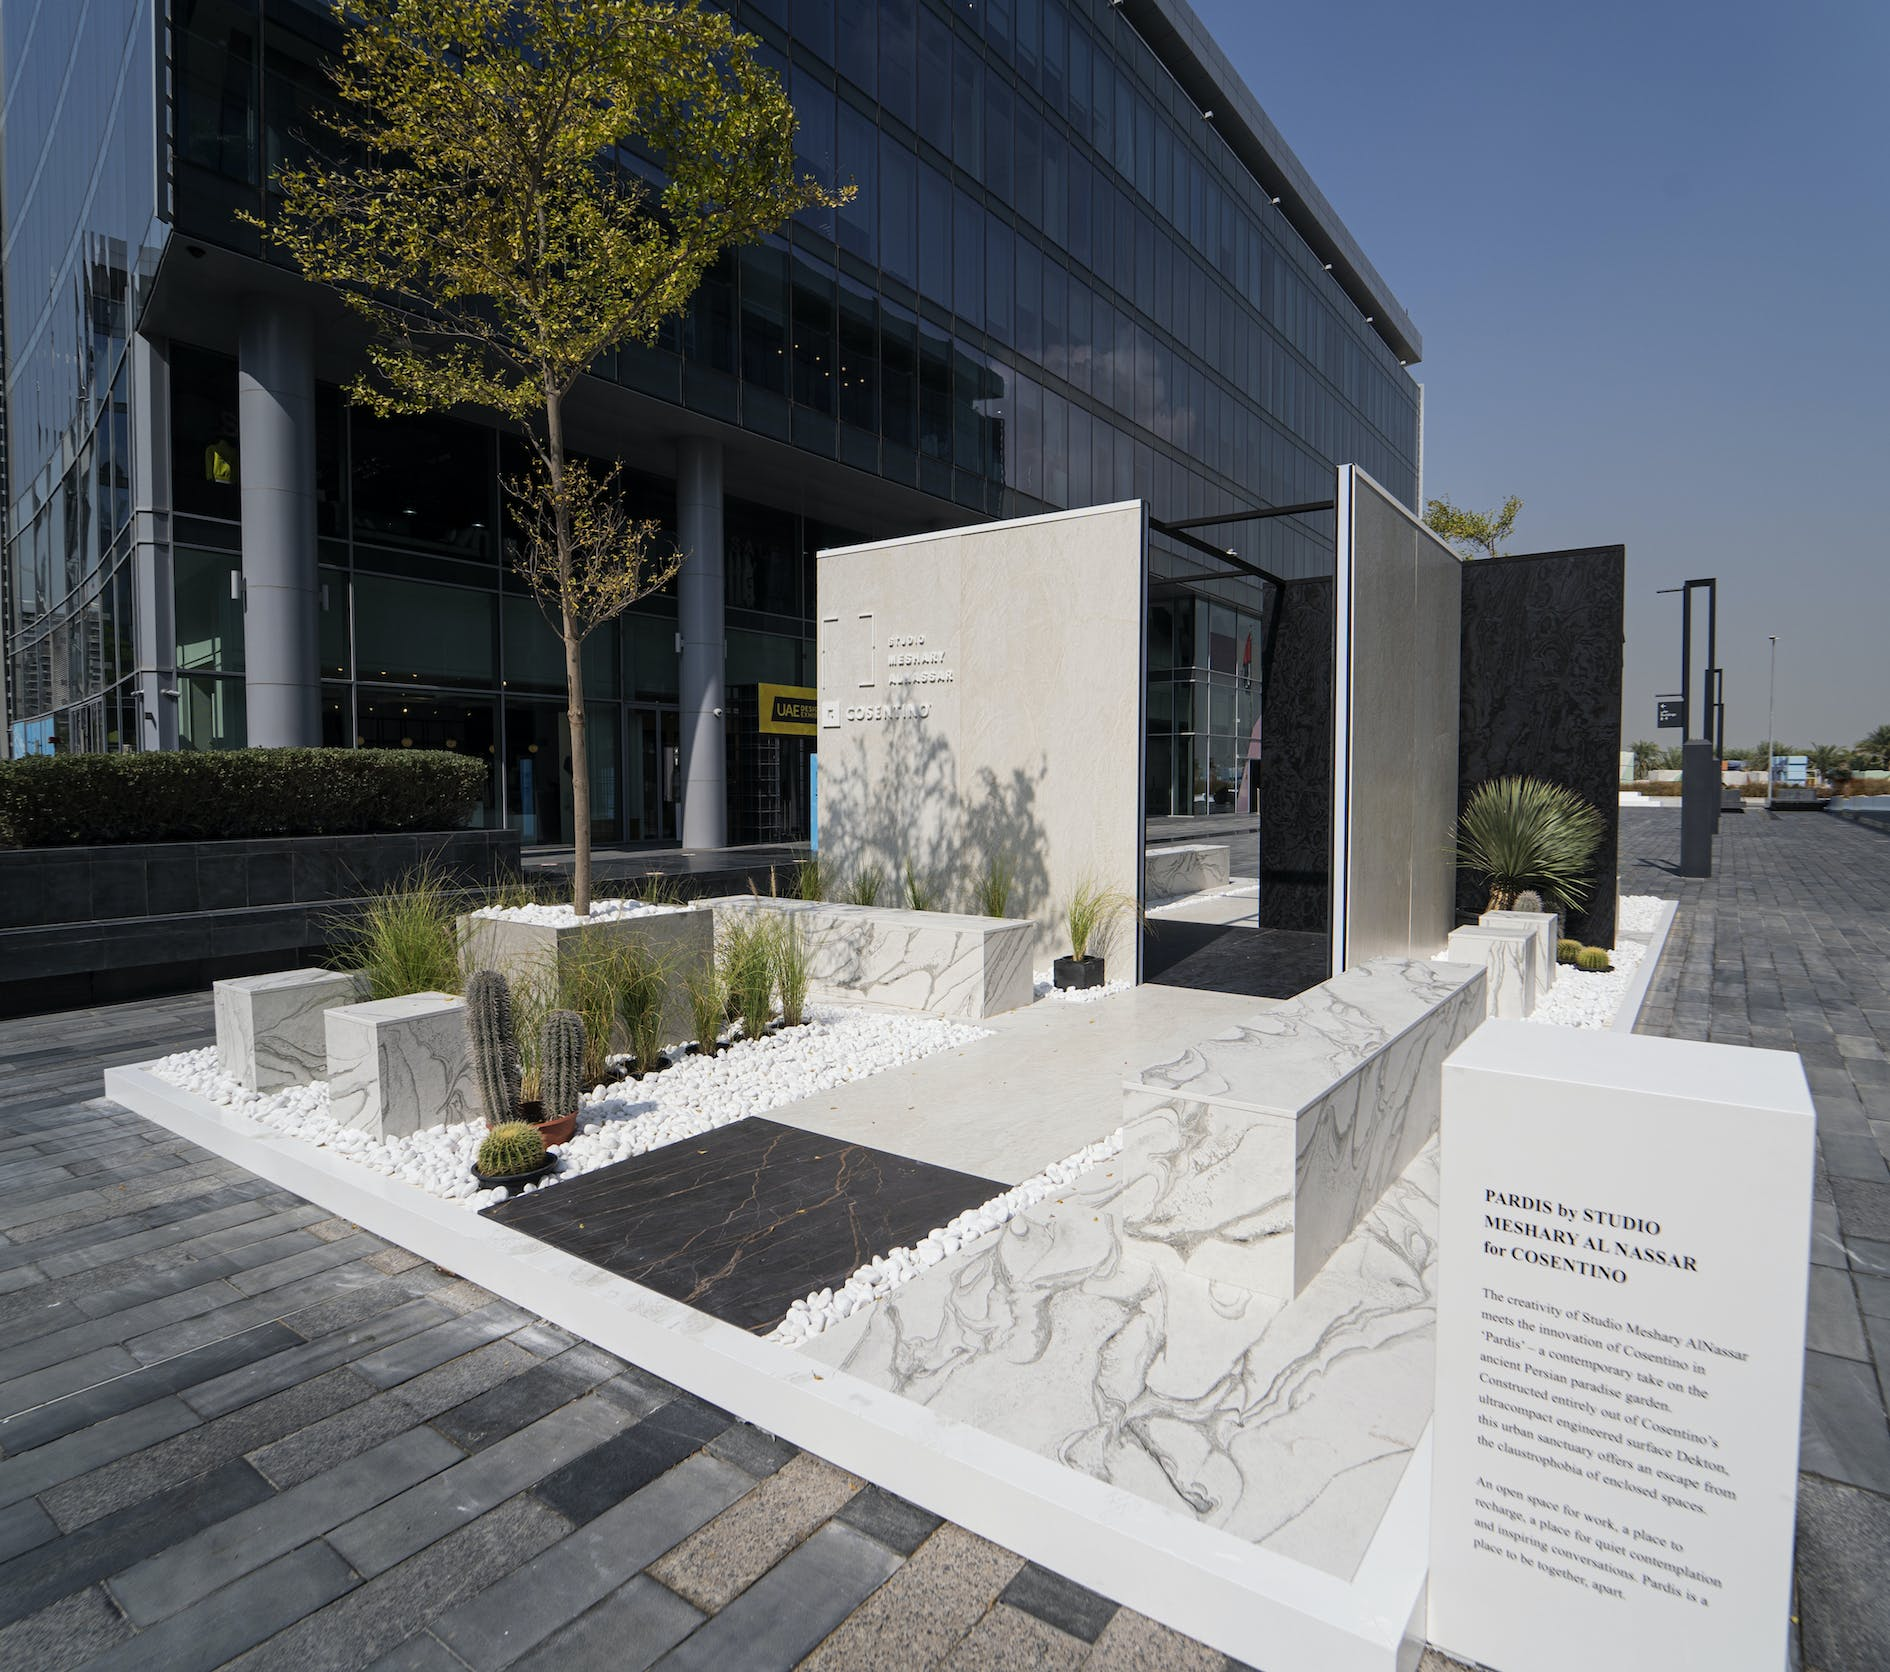 Image of Pardis DektonbyCosentino DDW 2020 2 1 in Cosentino presents 'Pardis' at Dubai Design Week 2020 - Cosentino